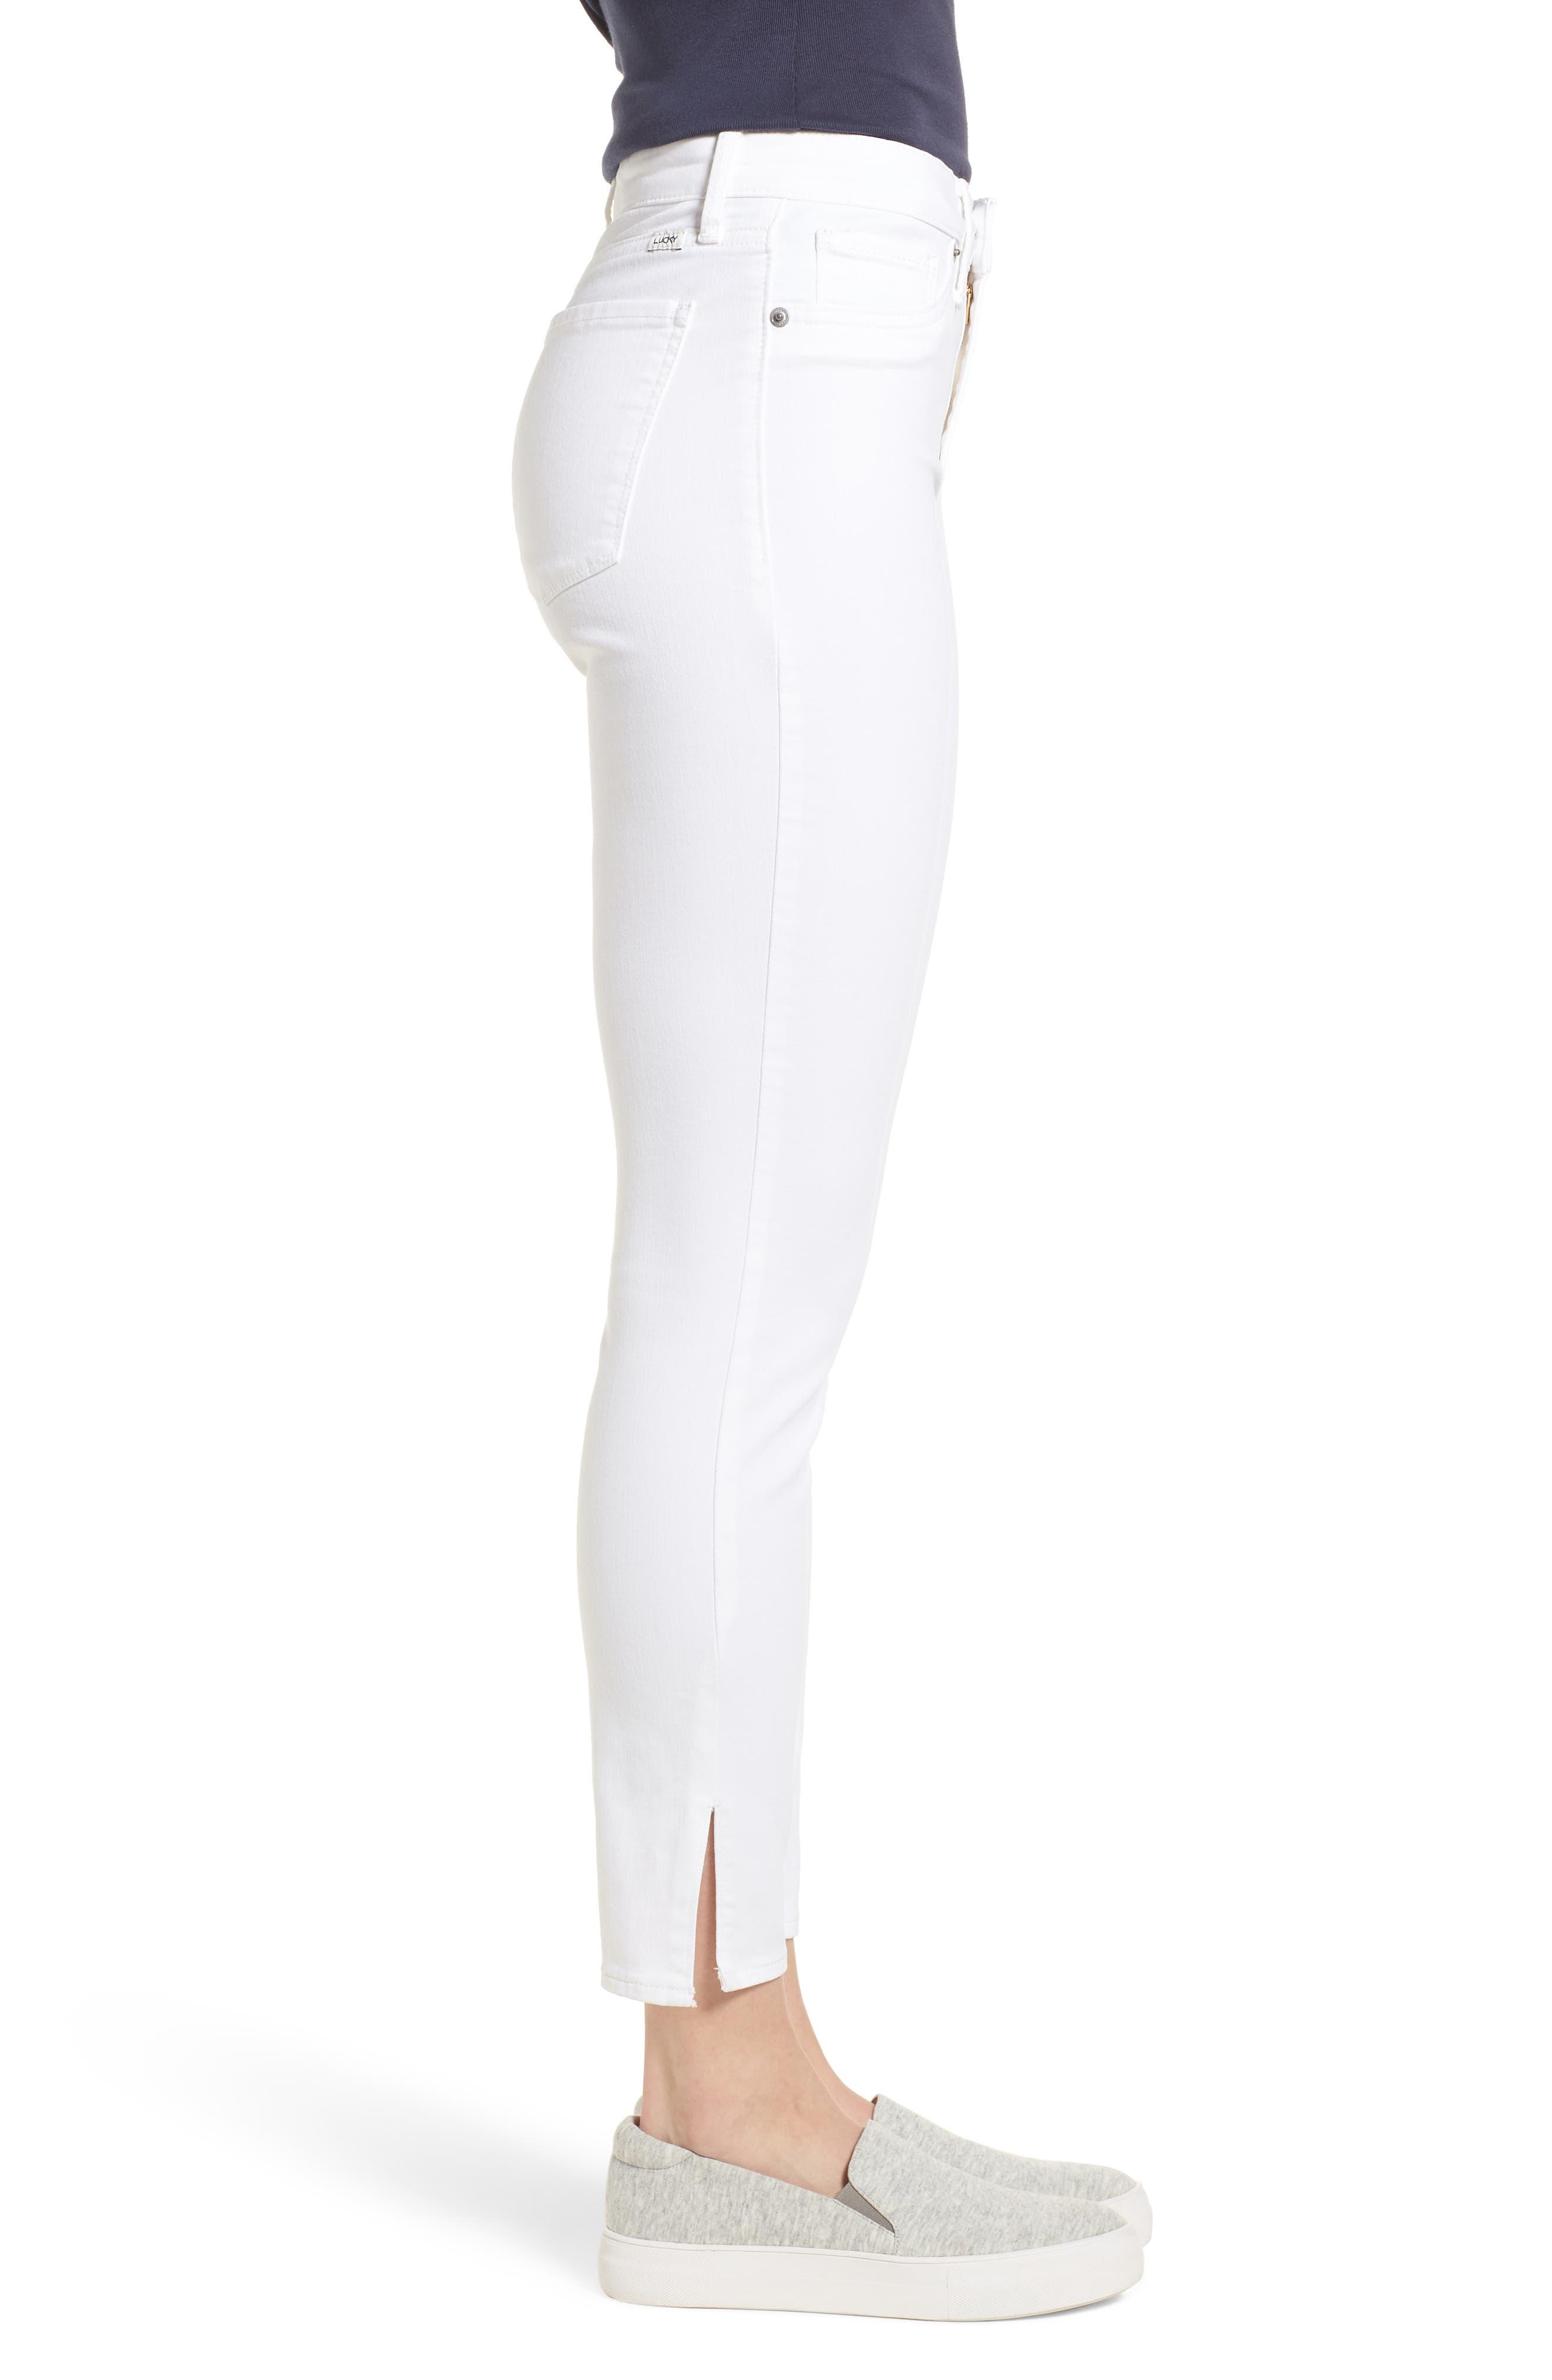 Ava Skinny White Jeans,                             Alternate thumbnail 3, color,                             Clean White